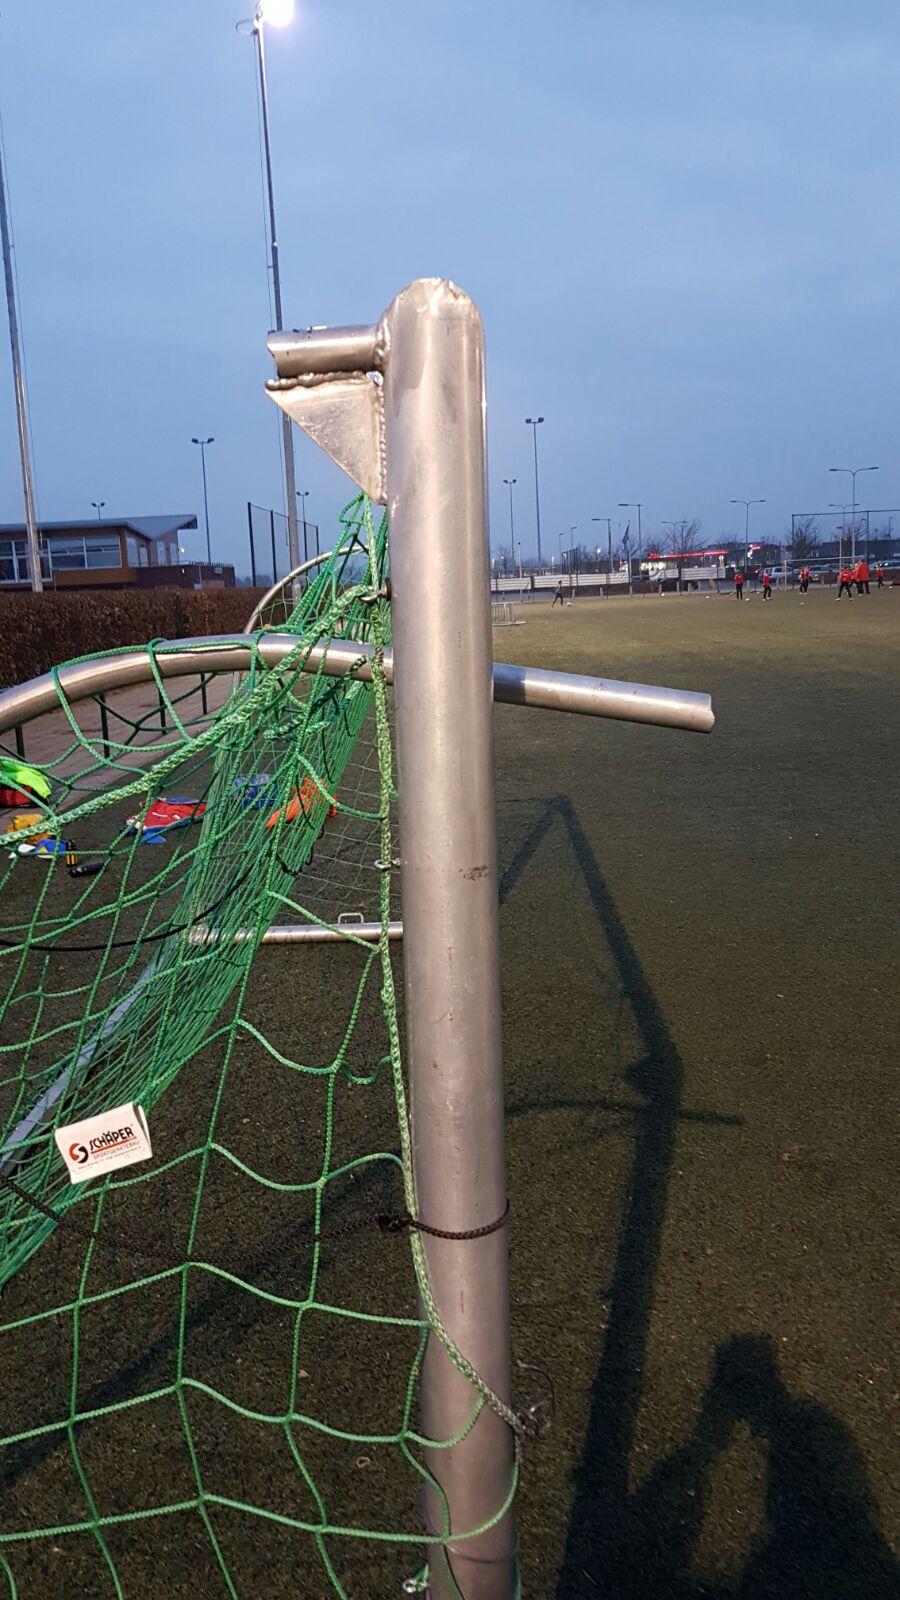 vandalisme op Sportpark Schuytgraaf